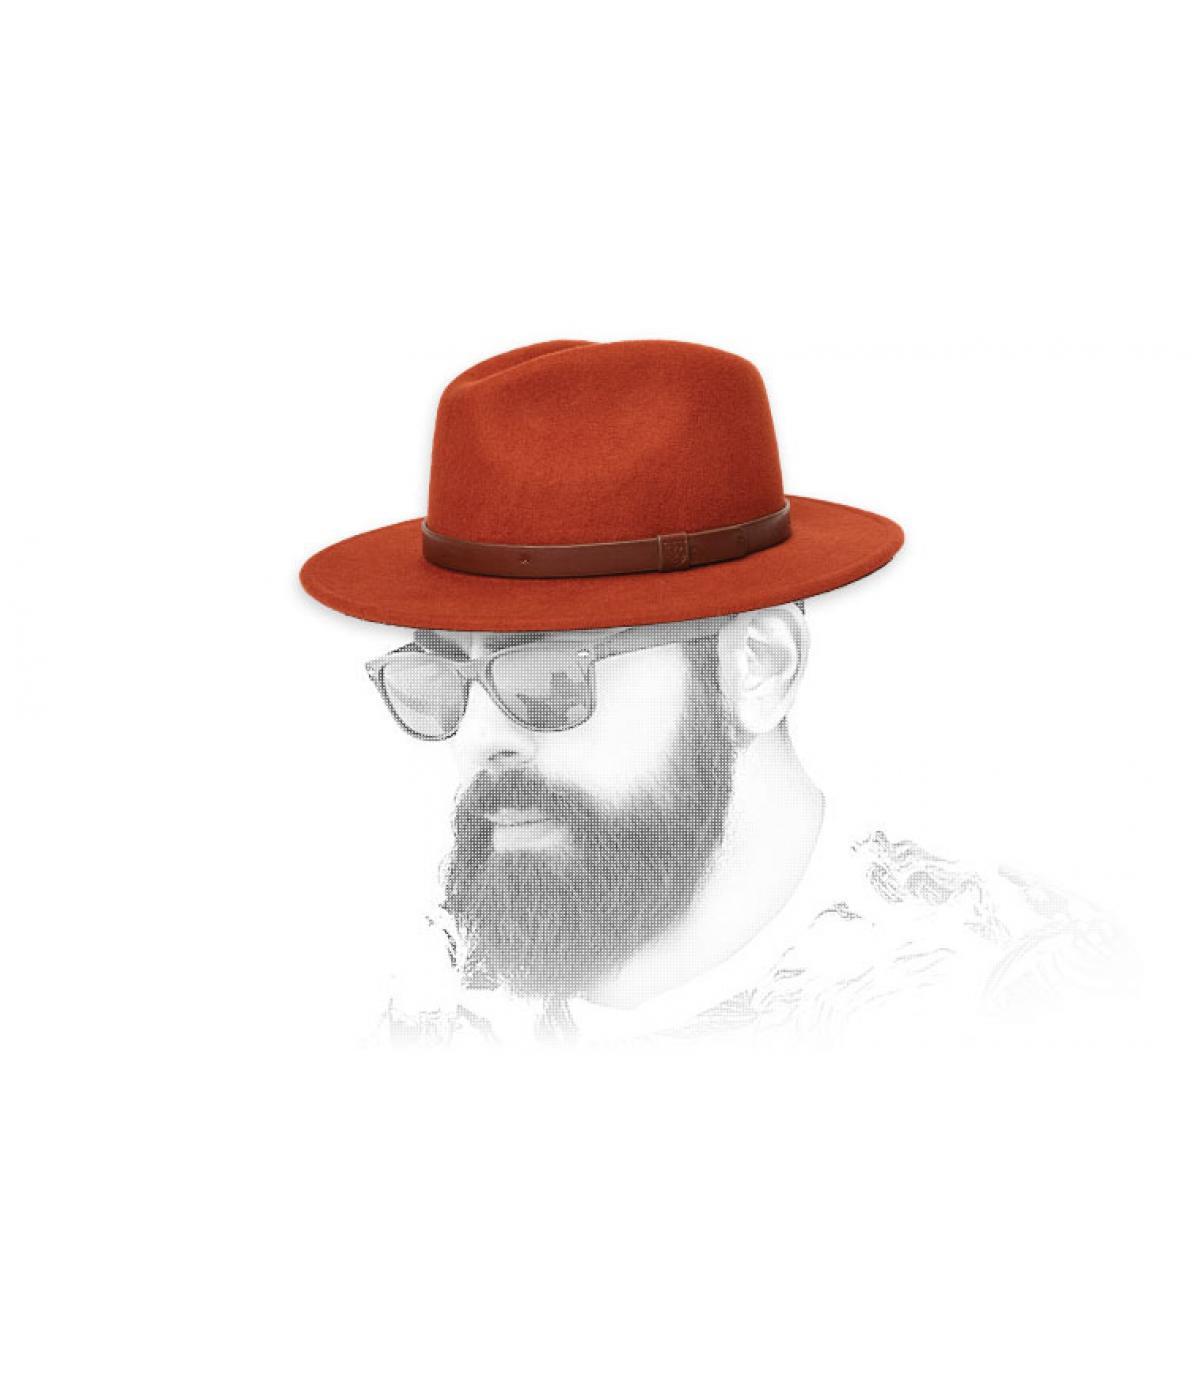 red felt hat